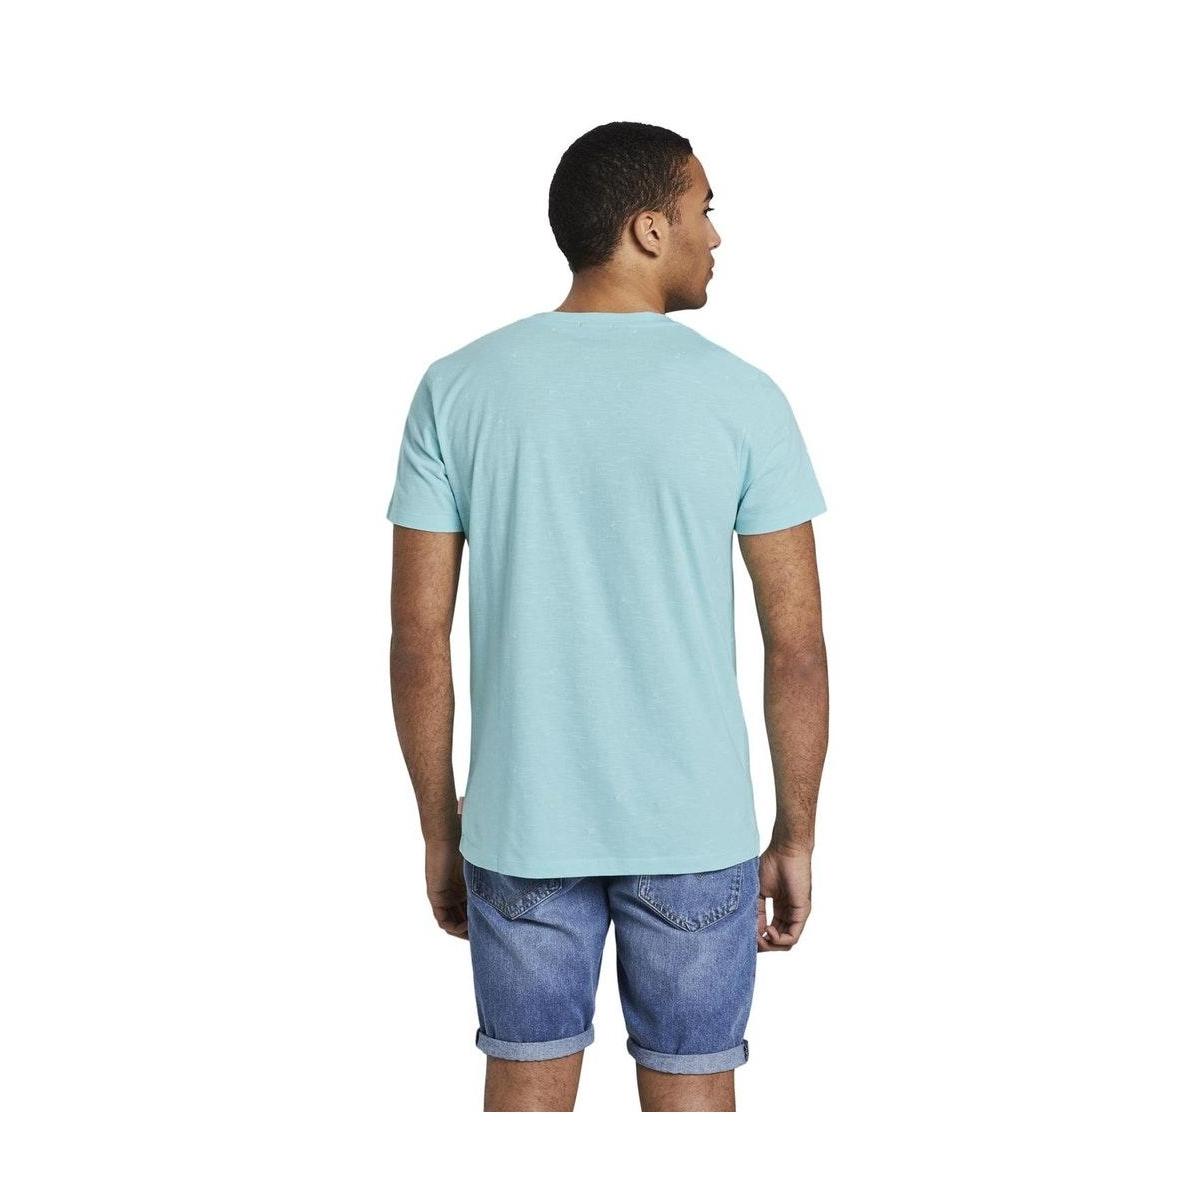 t shirt met allover print 1019088xx12 tom tailor t-shirt 23120